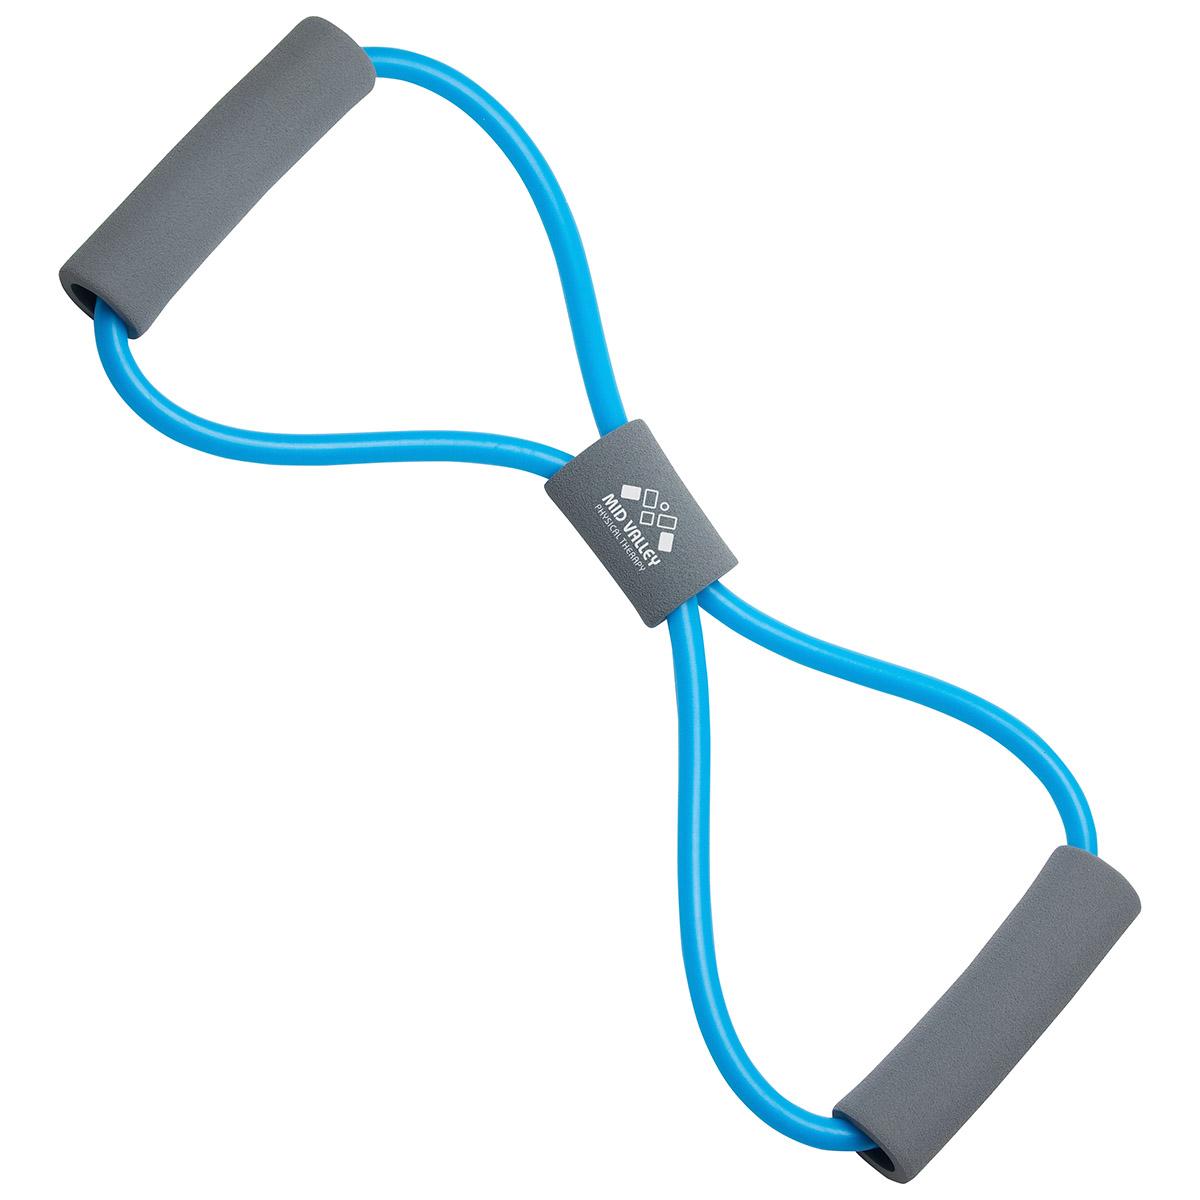 Fitness First Stretch Expander - Medium Resistance, WHF-MR15 - 1 Colour Imprint